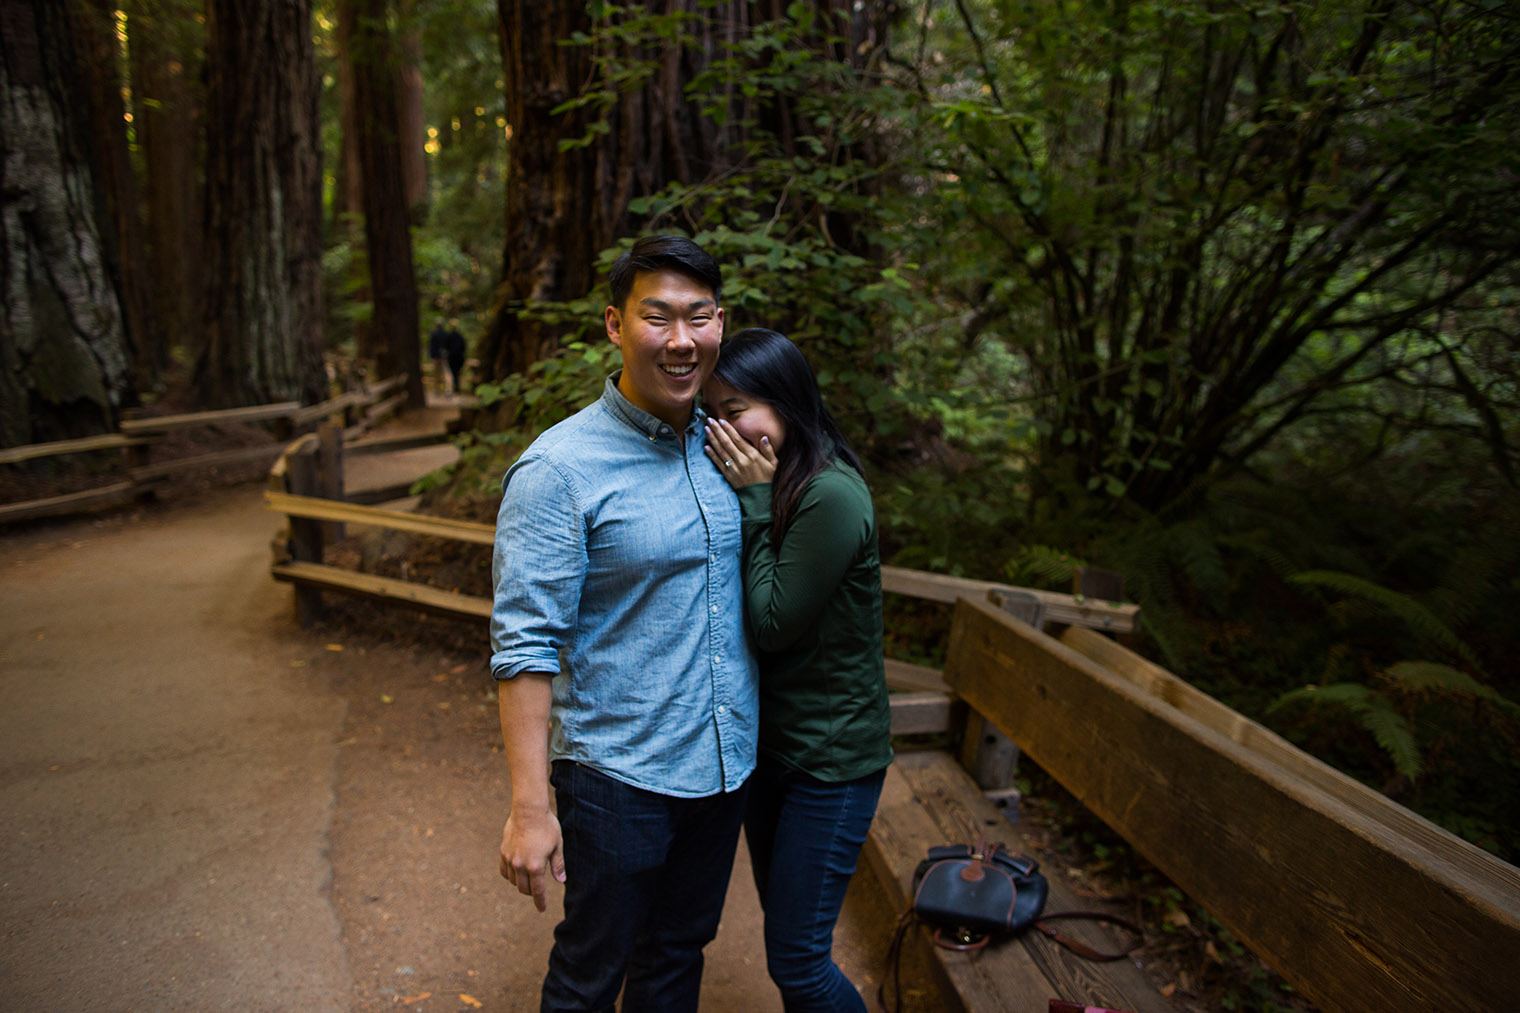 muir woods proposal wedding photographer